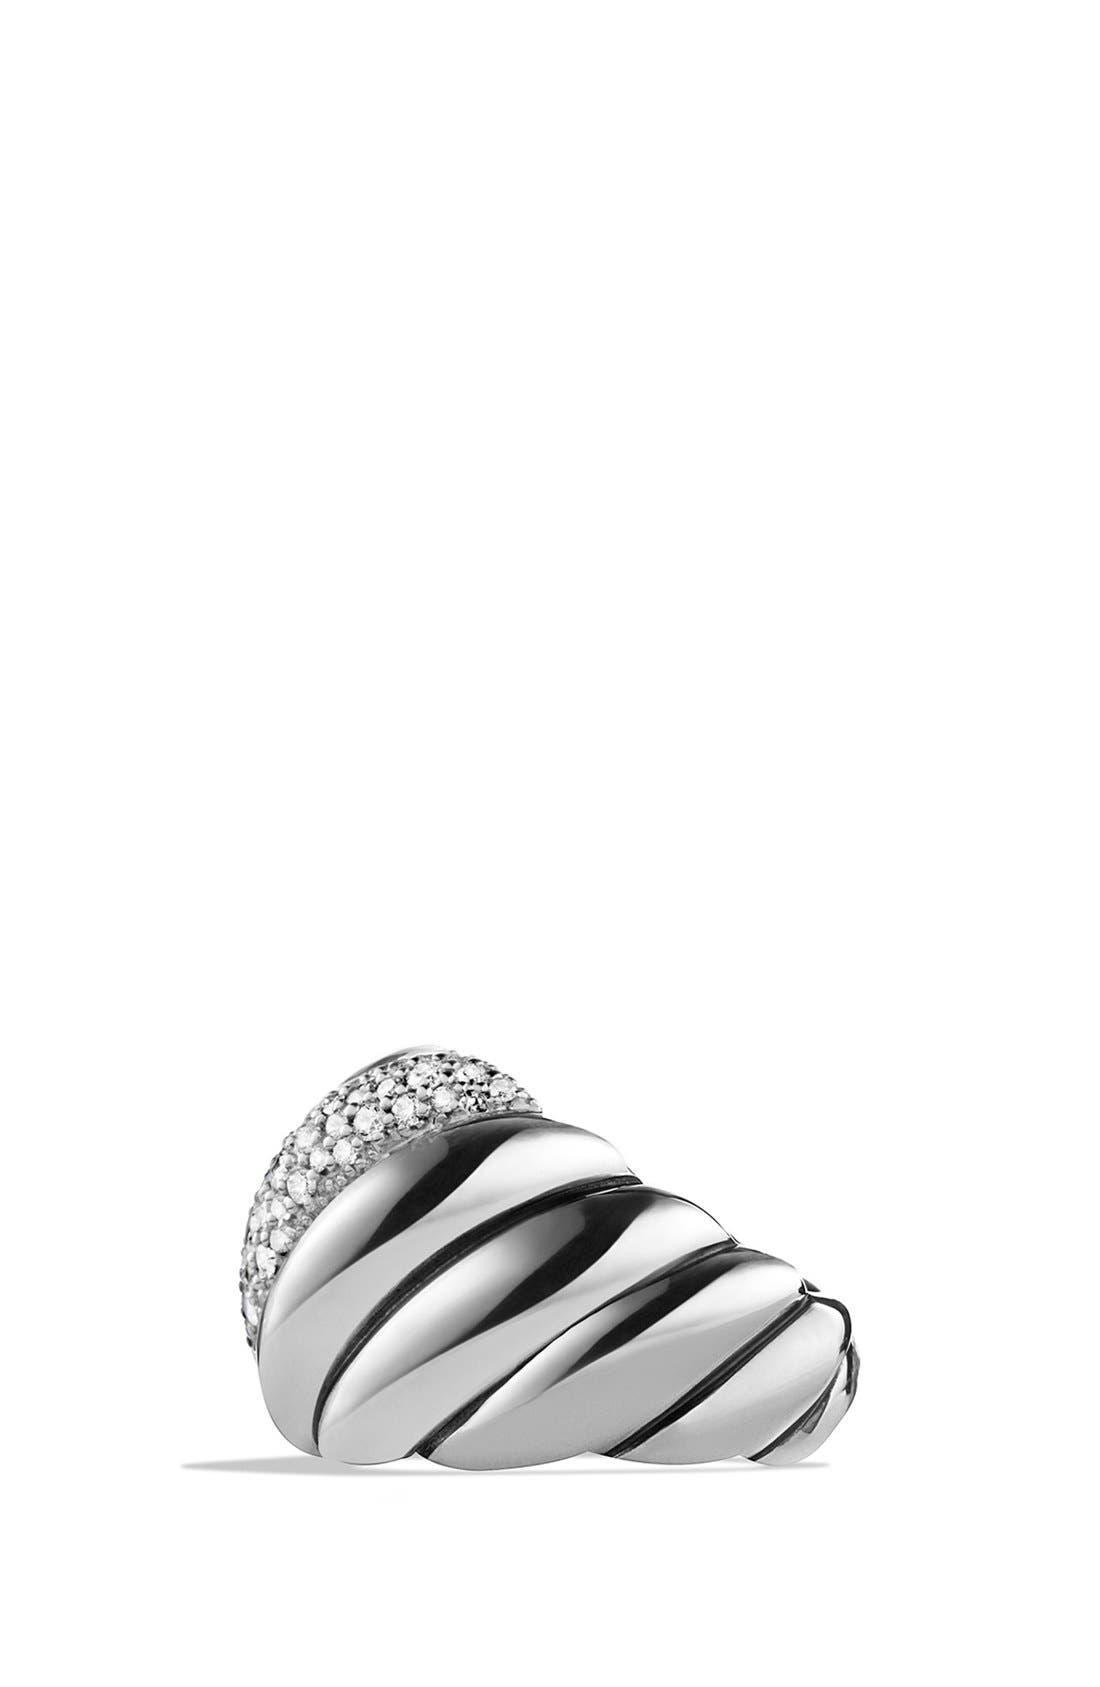 Alternate Image 3  - David Yurman 'Hampton Cable' Ring with Diamonds